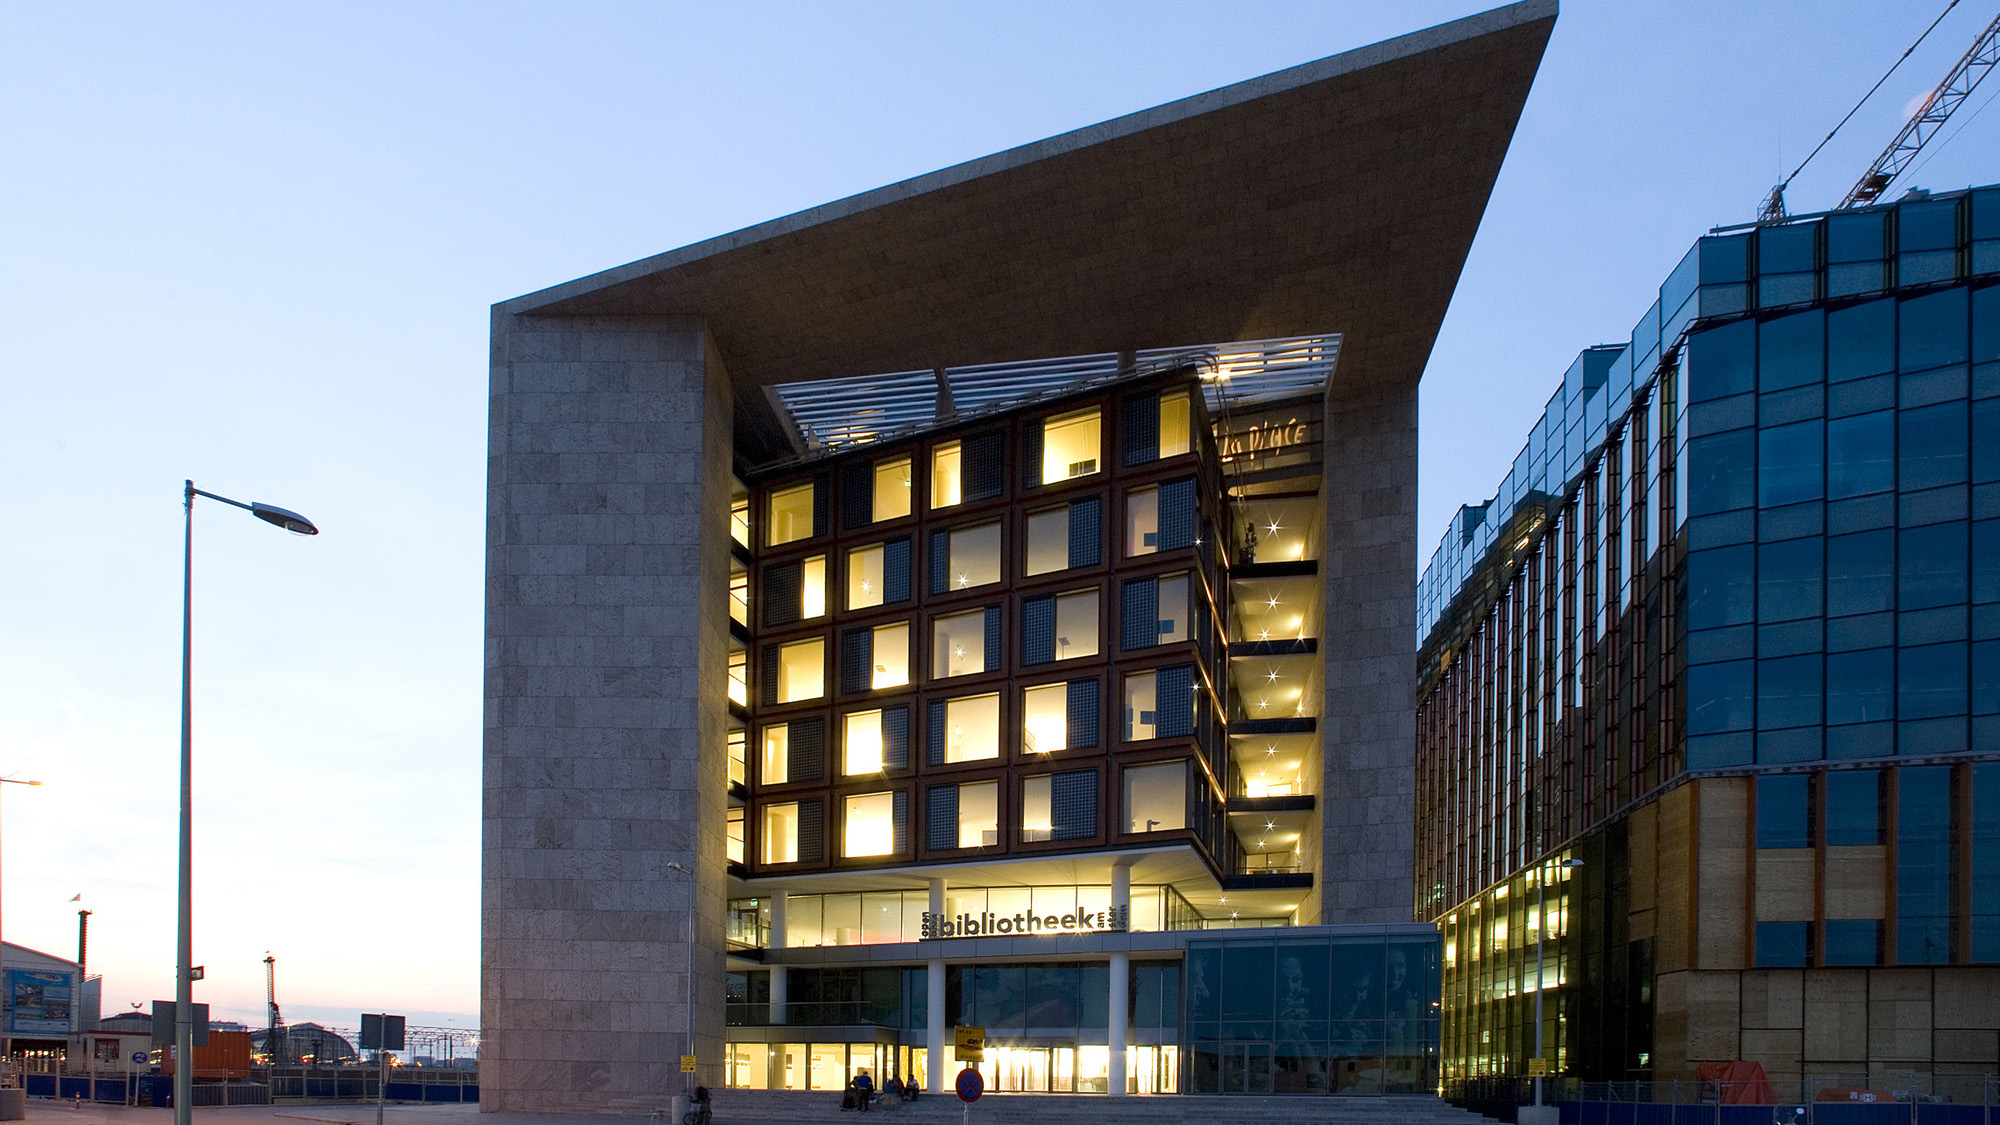 Centrale Bibliotheek Amsterdam